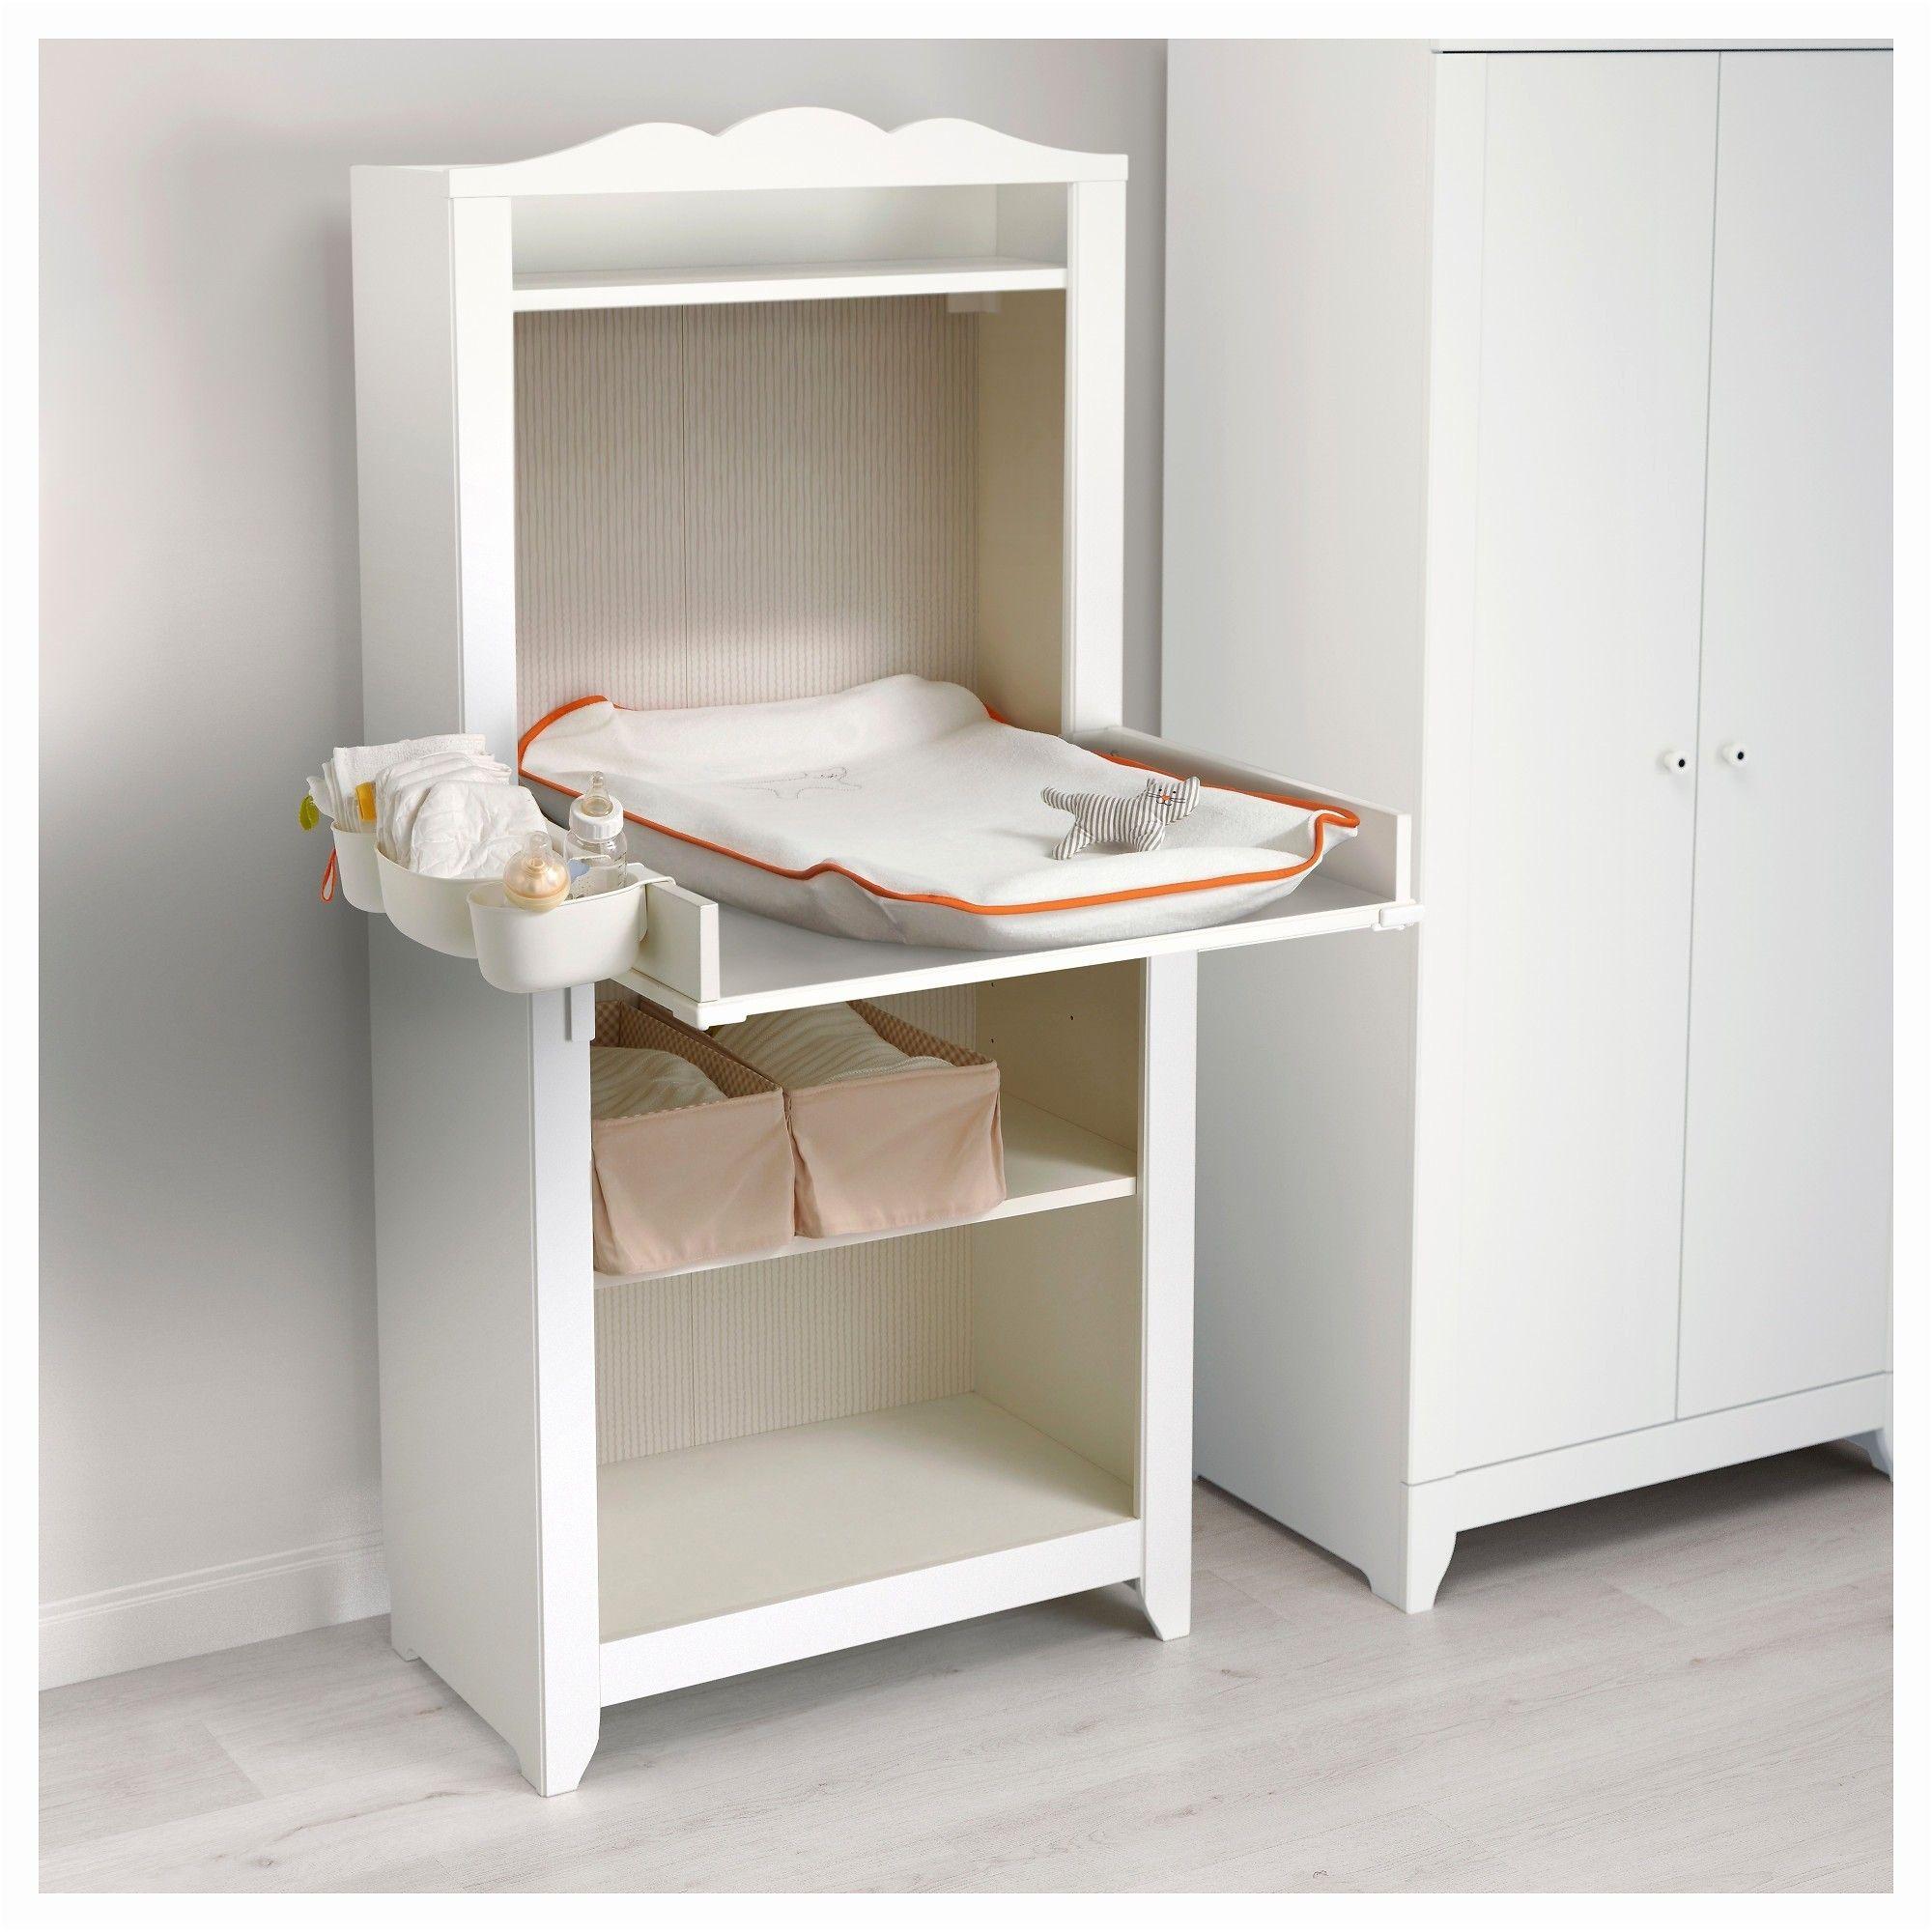 Table A Langer Baignoire Pas Cher Table A Langer Baignoire Pas Cher Table A Langer Mural Achat Vente Pas Cher Cdis Folding Changing Table Ikea Storage Design